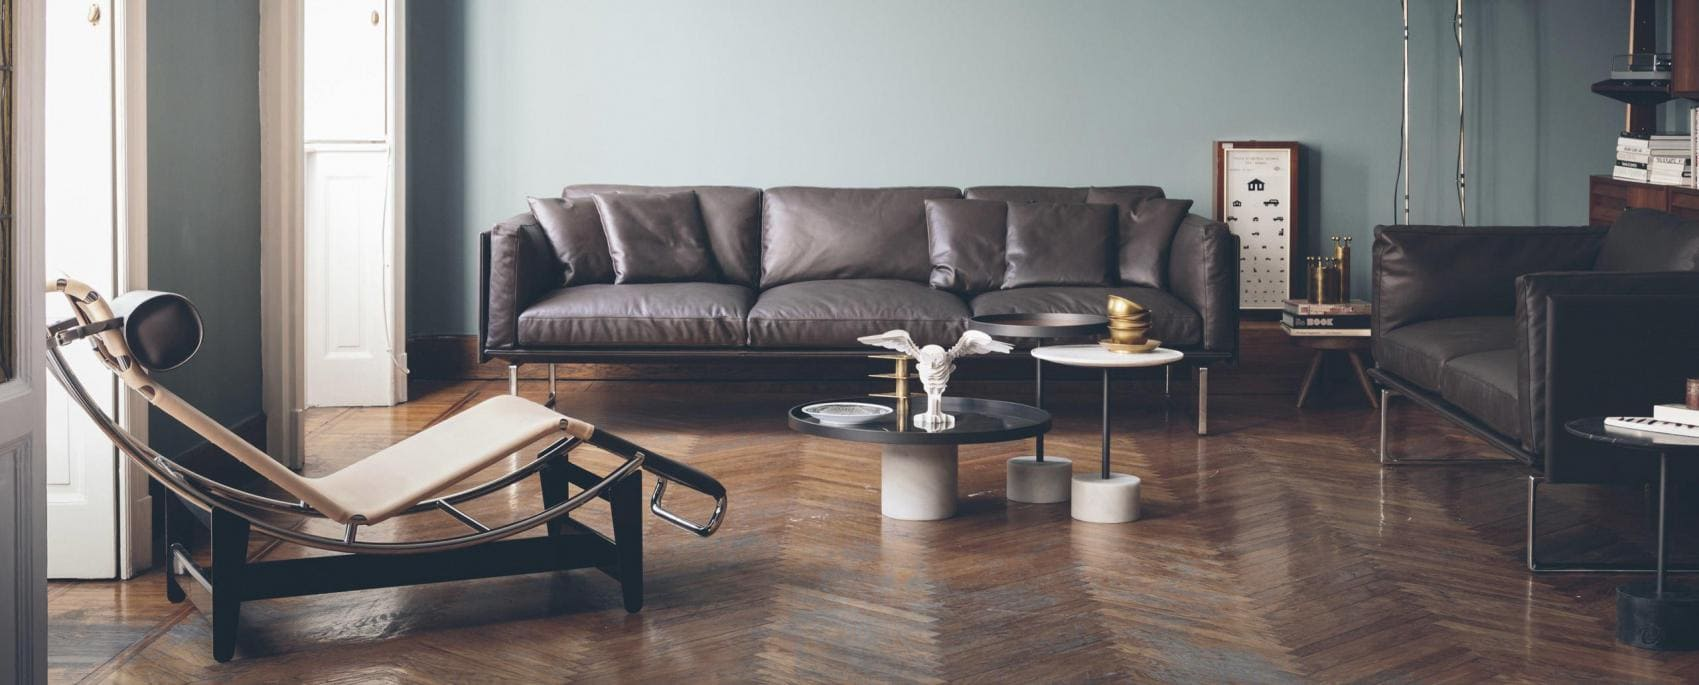 cassina møbler